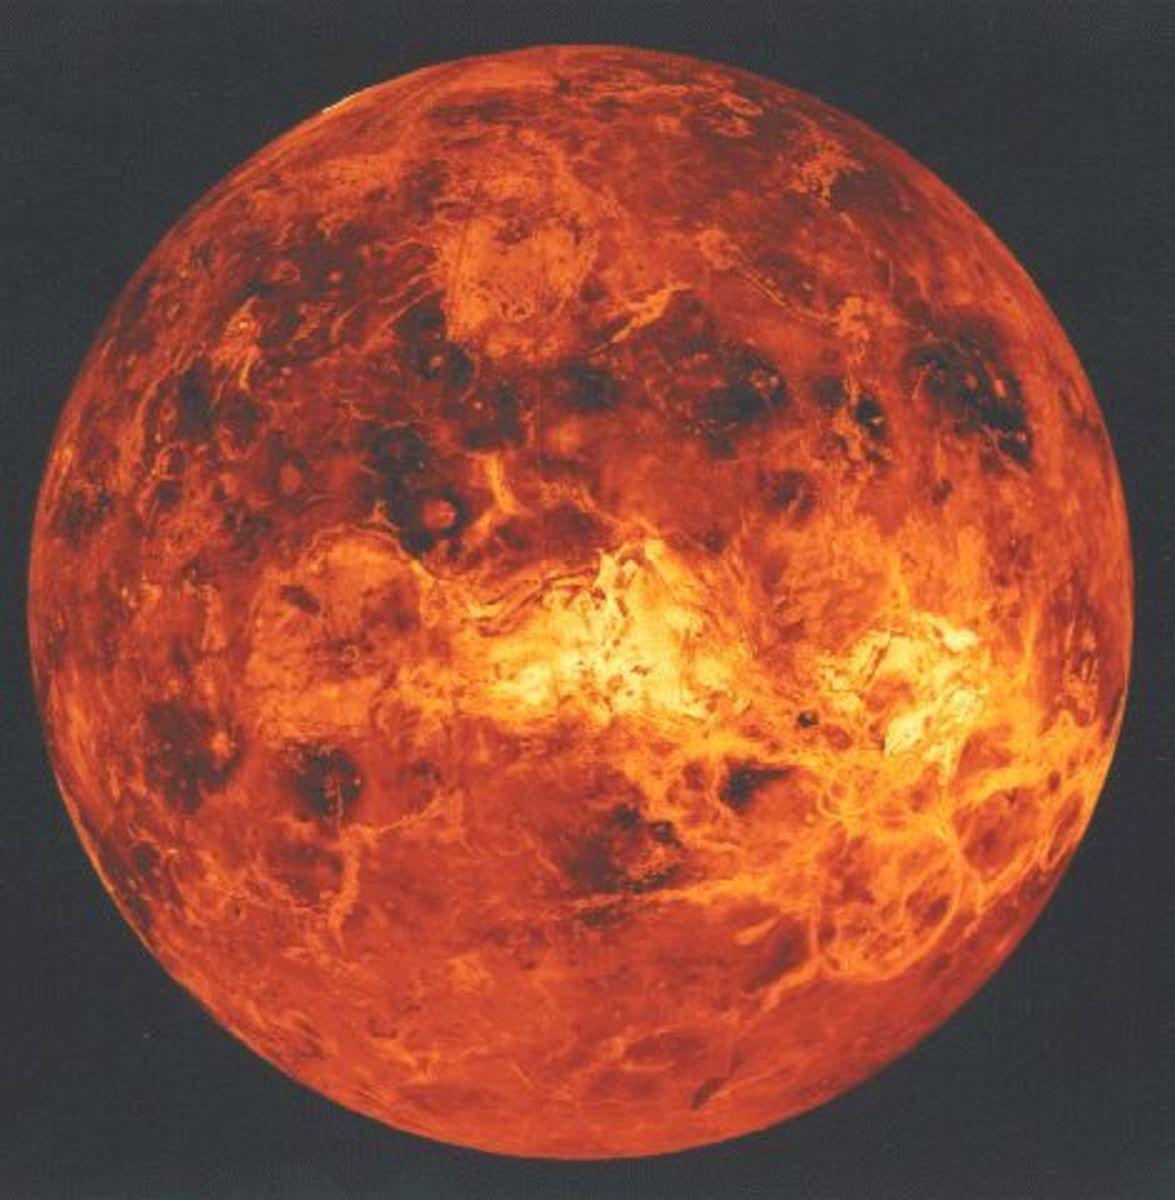 hubble mercury planet - photo #13